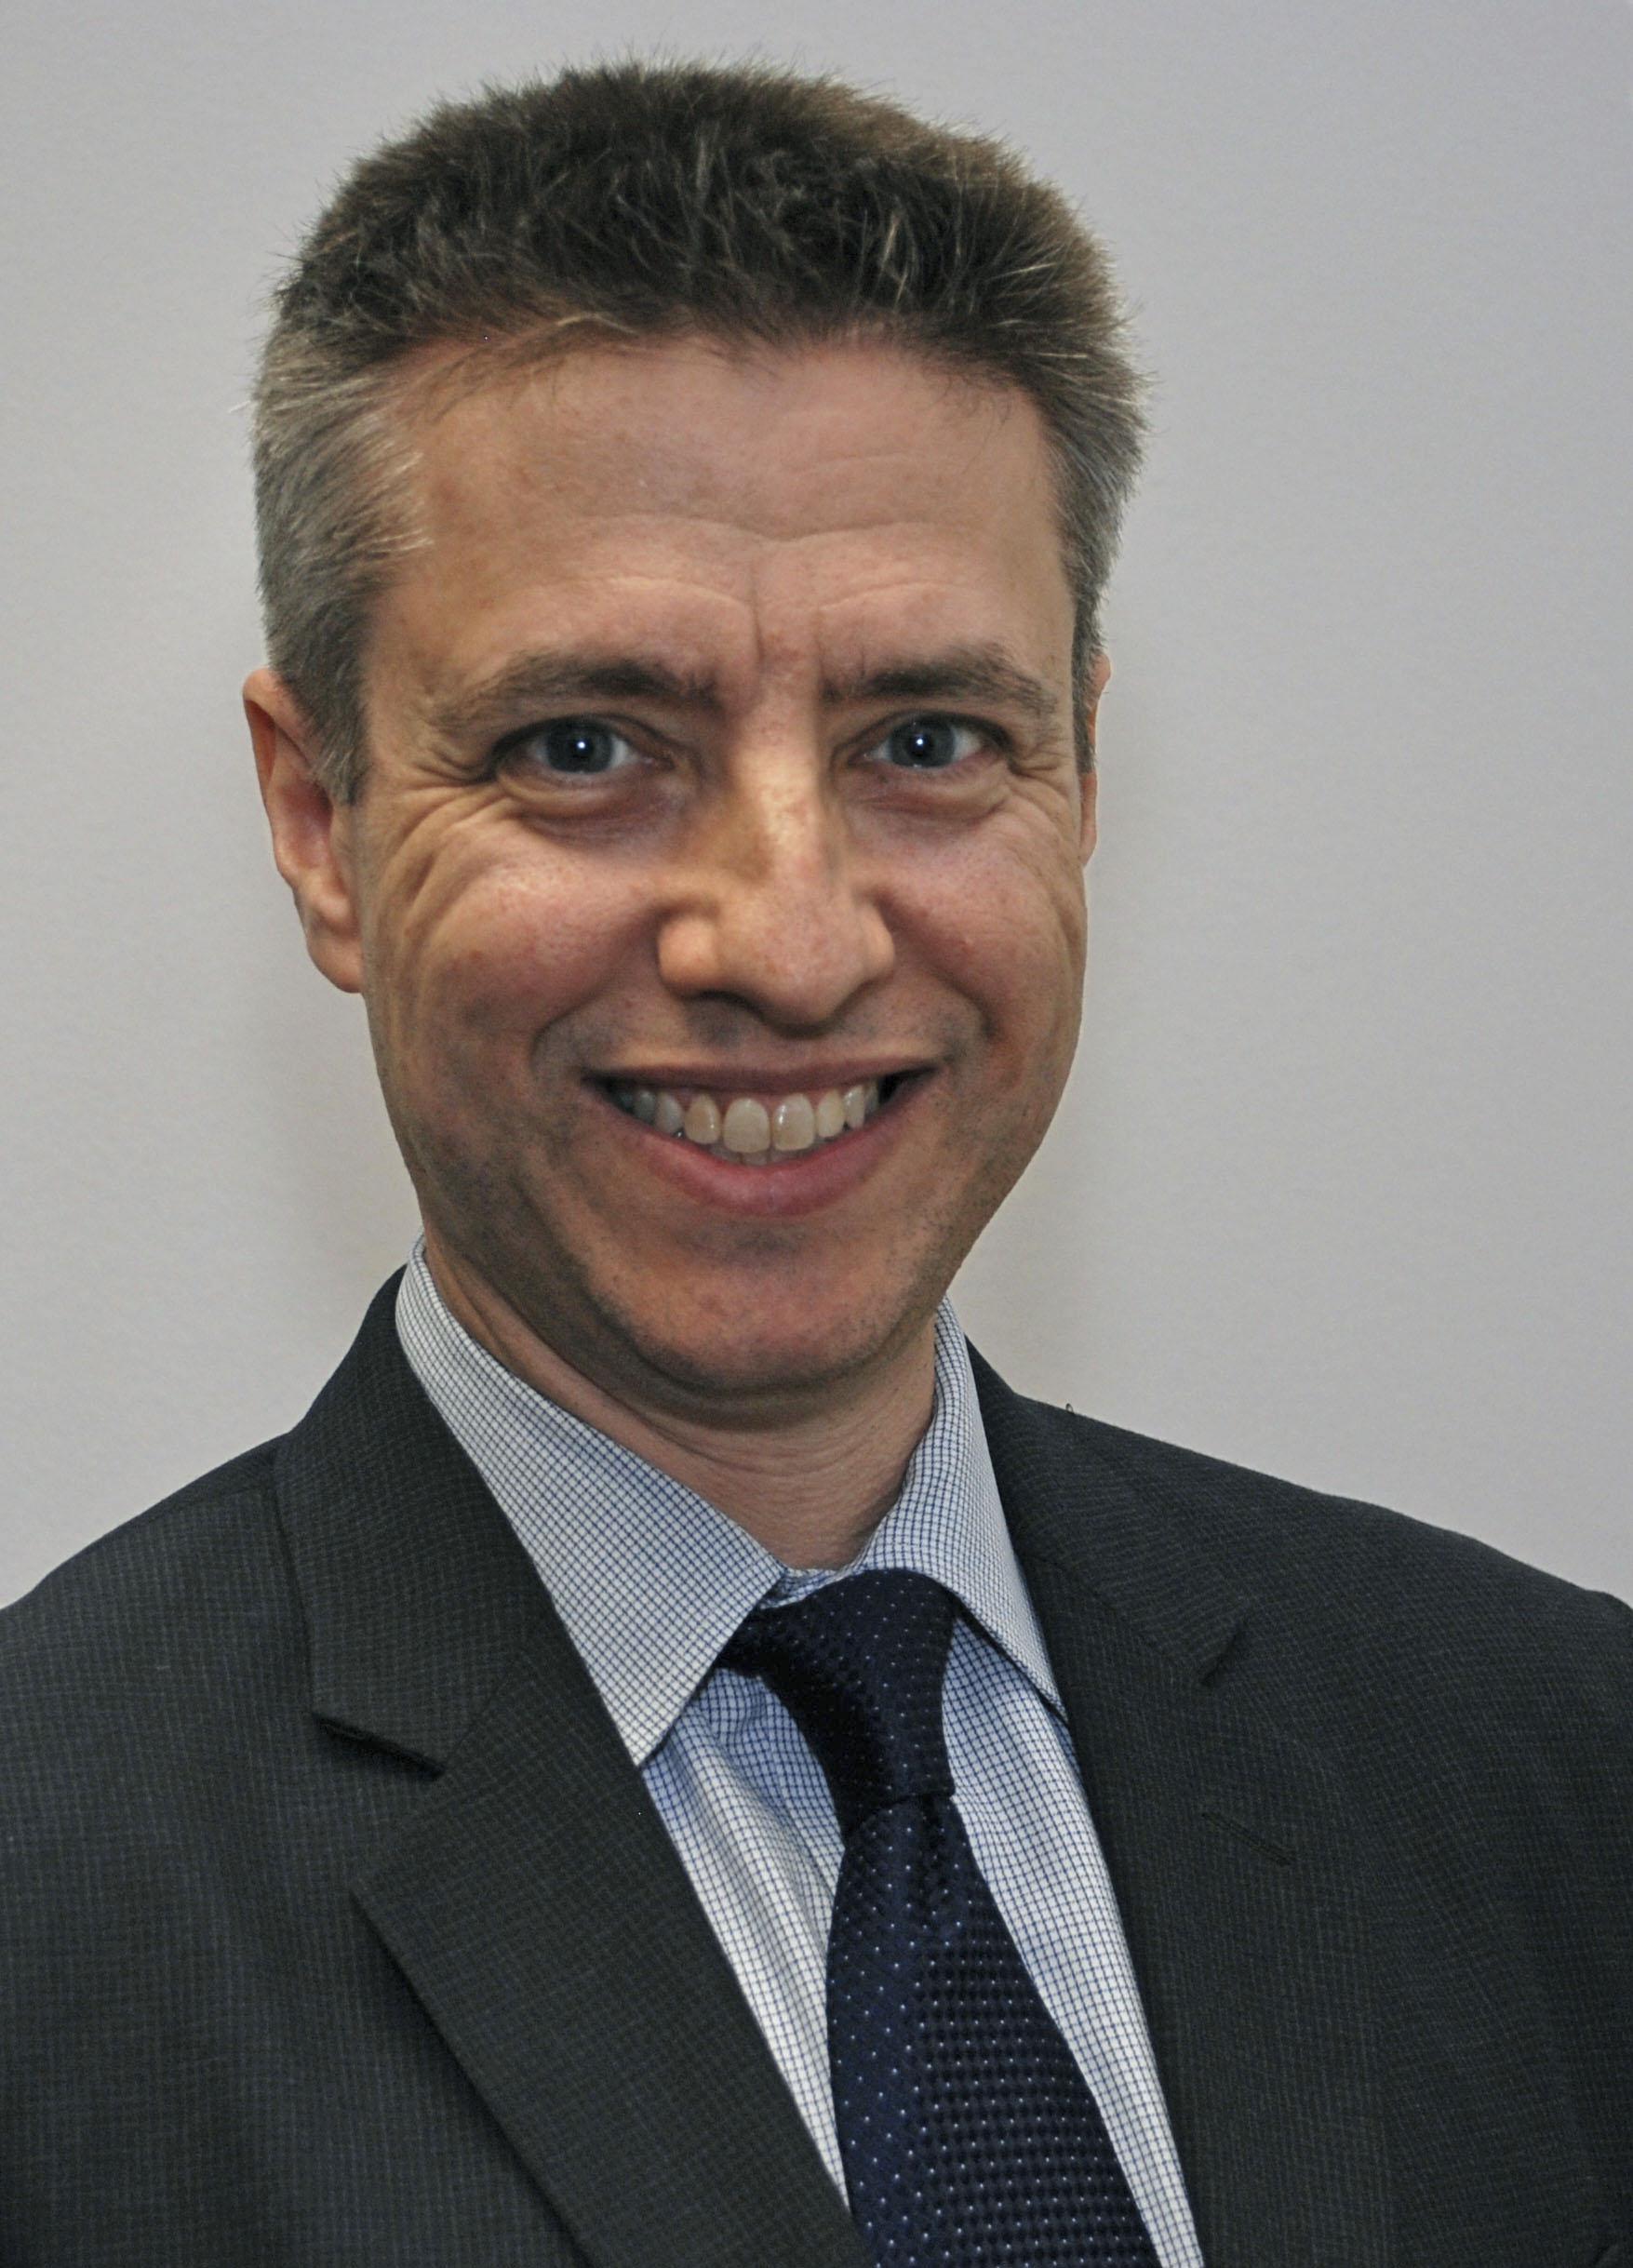 Gary Friedman, Long Island Commercial Real Estate Broker